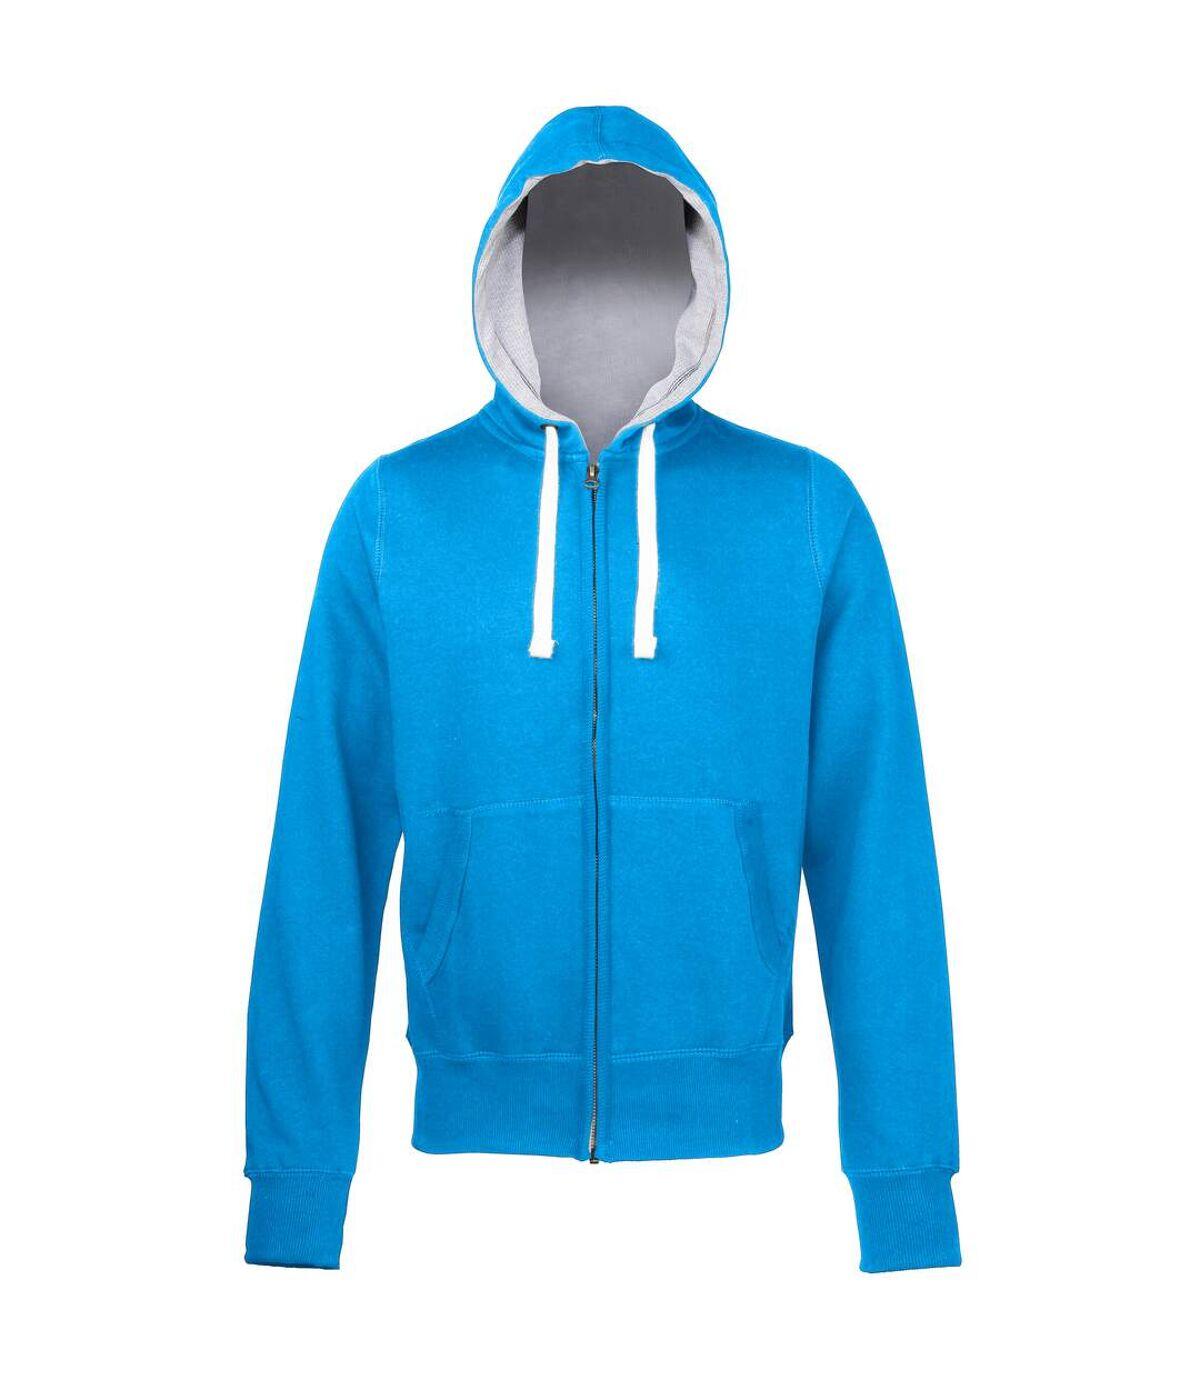 Awdis Chunky Premium Heavyweight Hooded Sweatshirt / Hoodie / Zoodie (Purple) - UTRW181